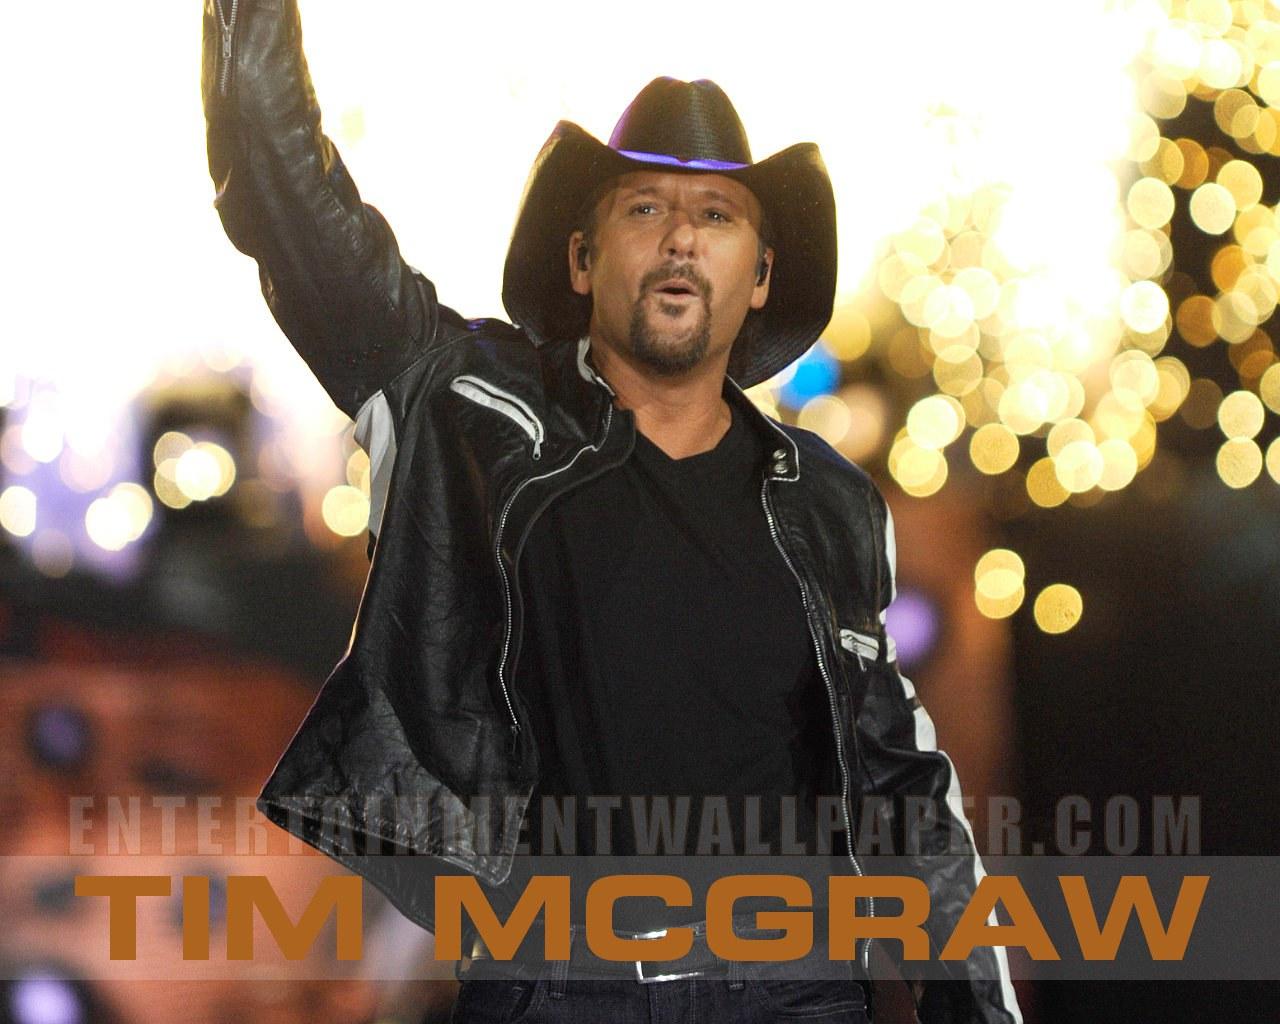 Tim McGraw Wallpaper   40035117 1280x1024 Desktop Download page 1280x1024